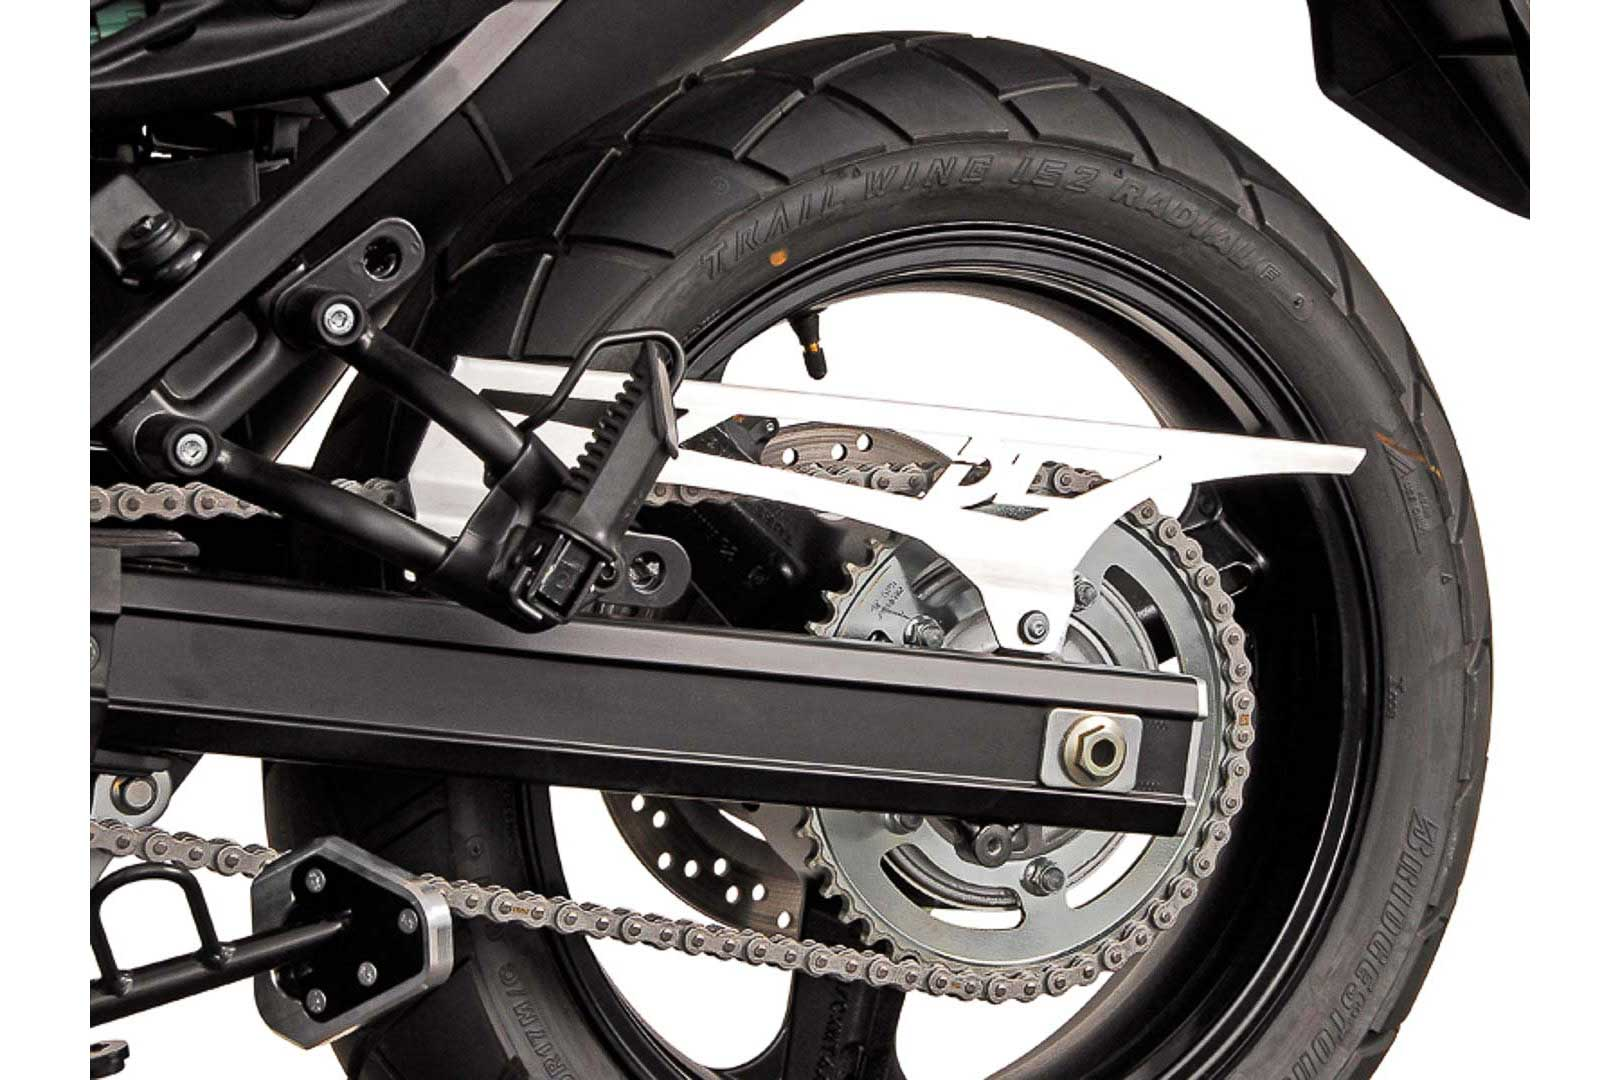 SW-Motech Ketjusuoja Suzuki DL650 V-Strom hopea